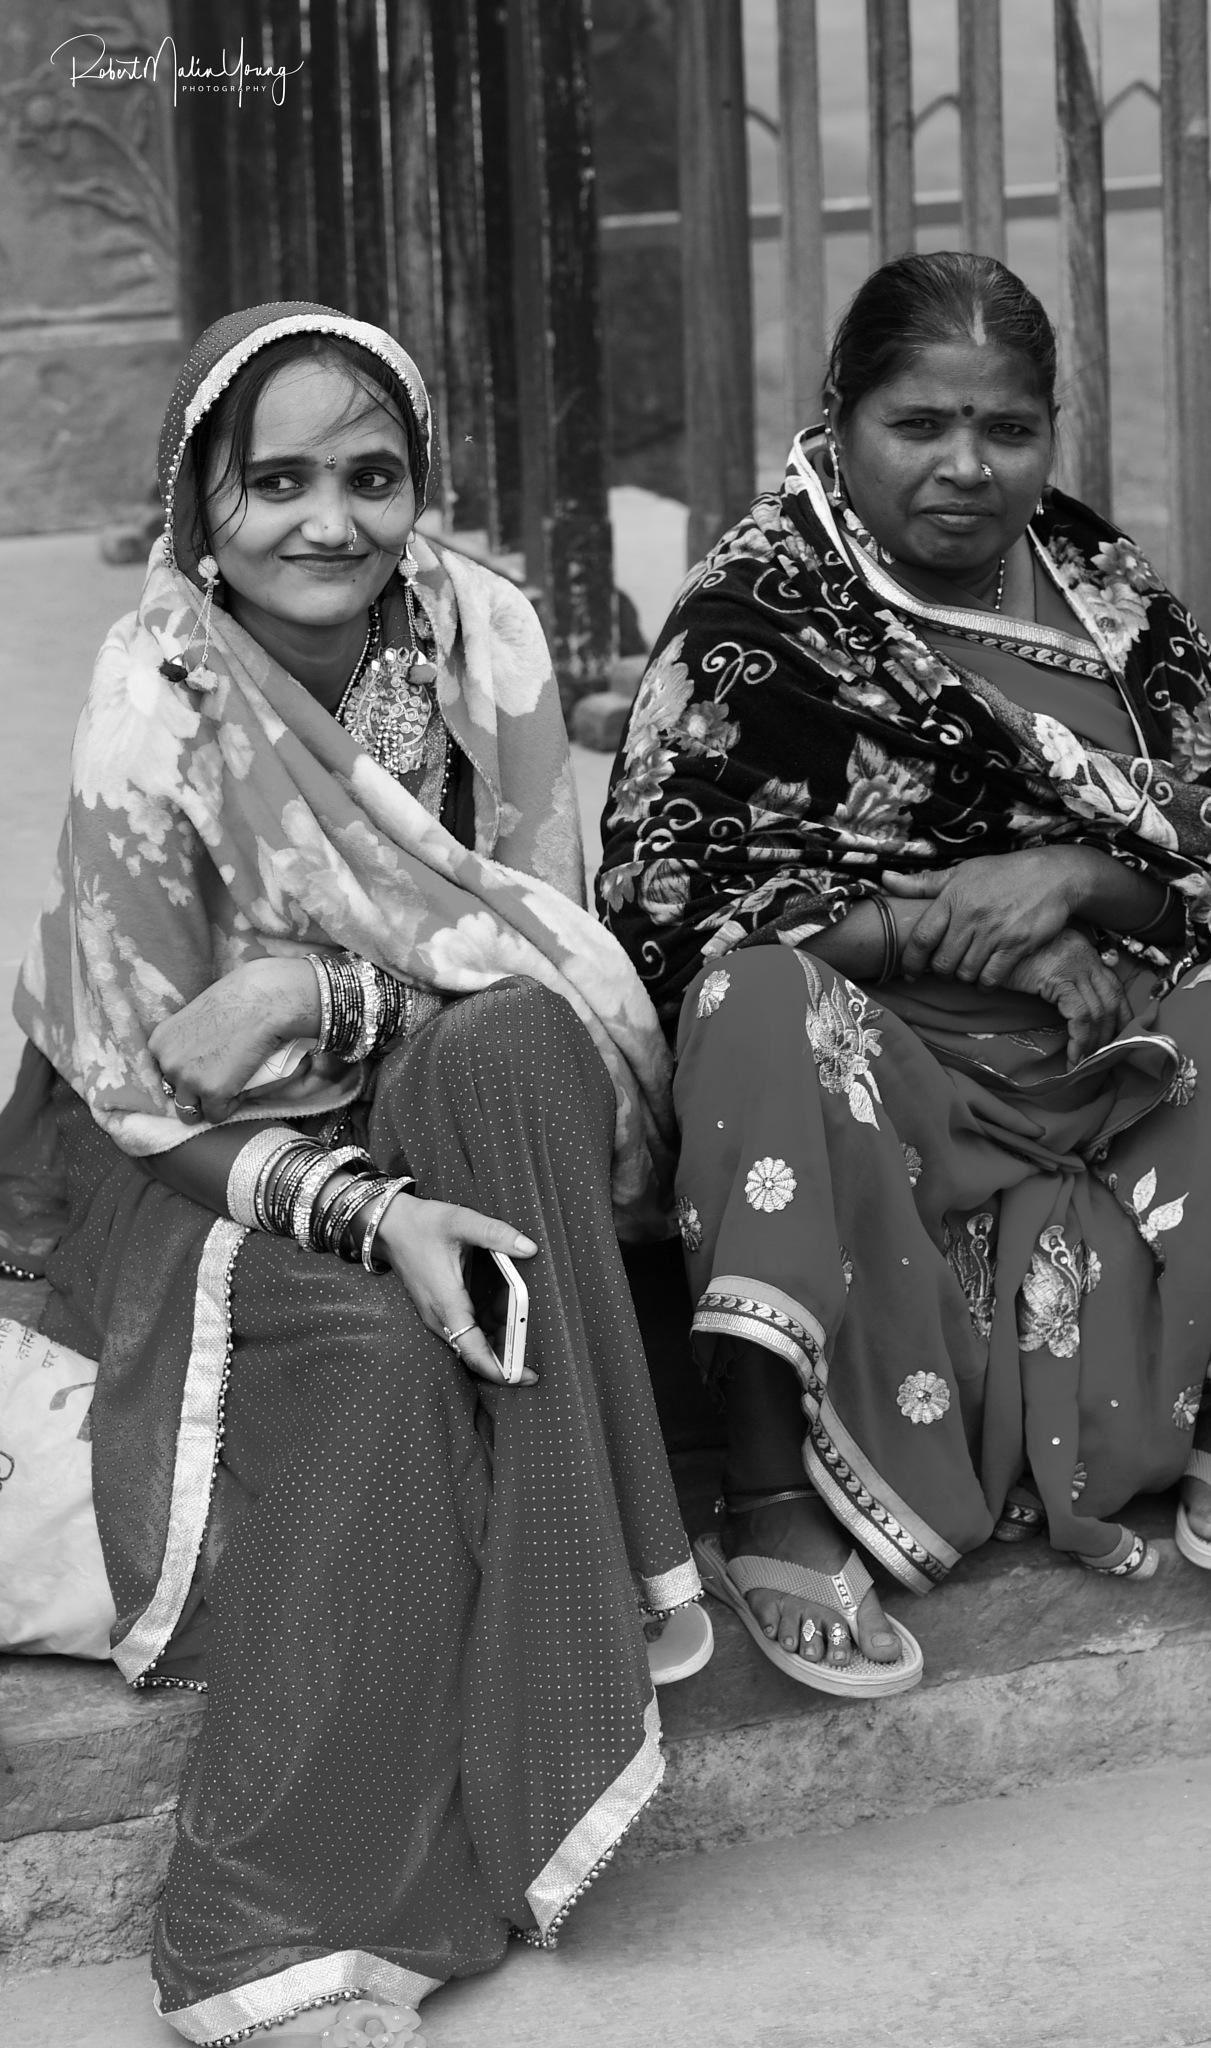 India 2017 by Robert Malin Young